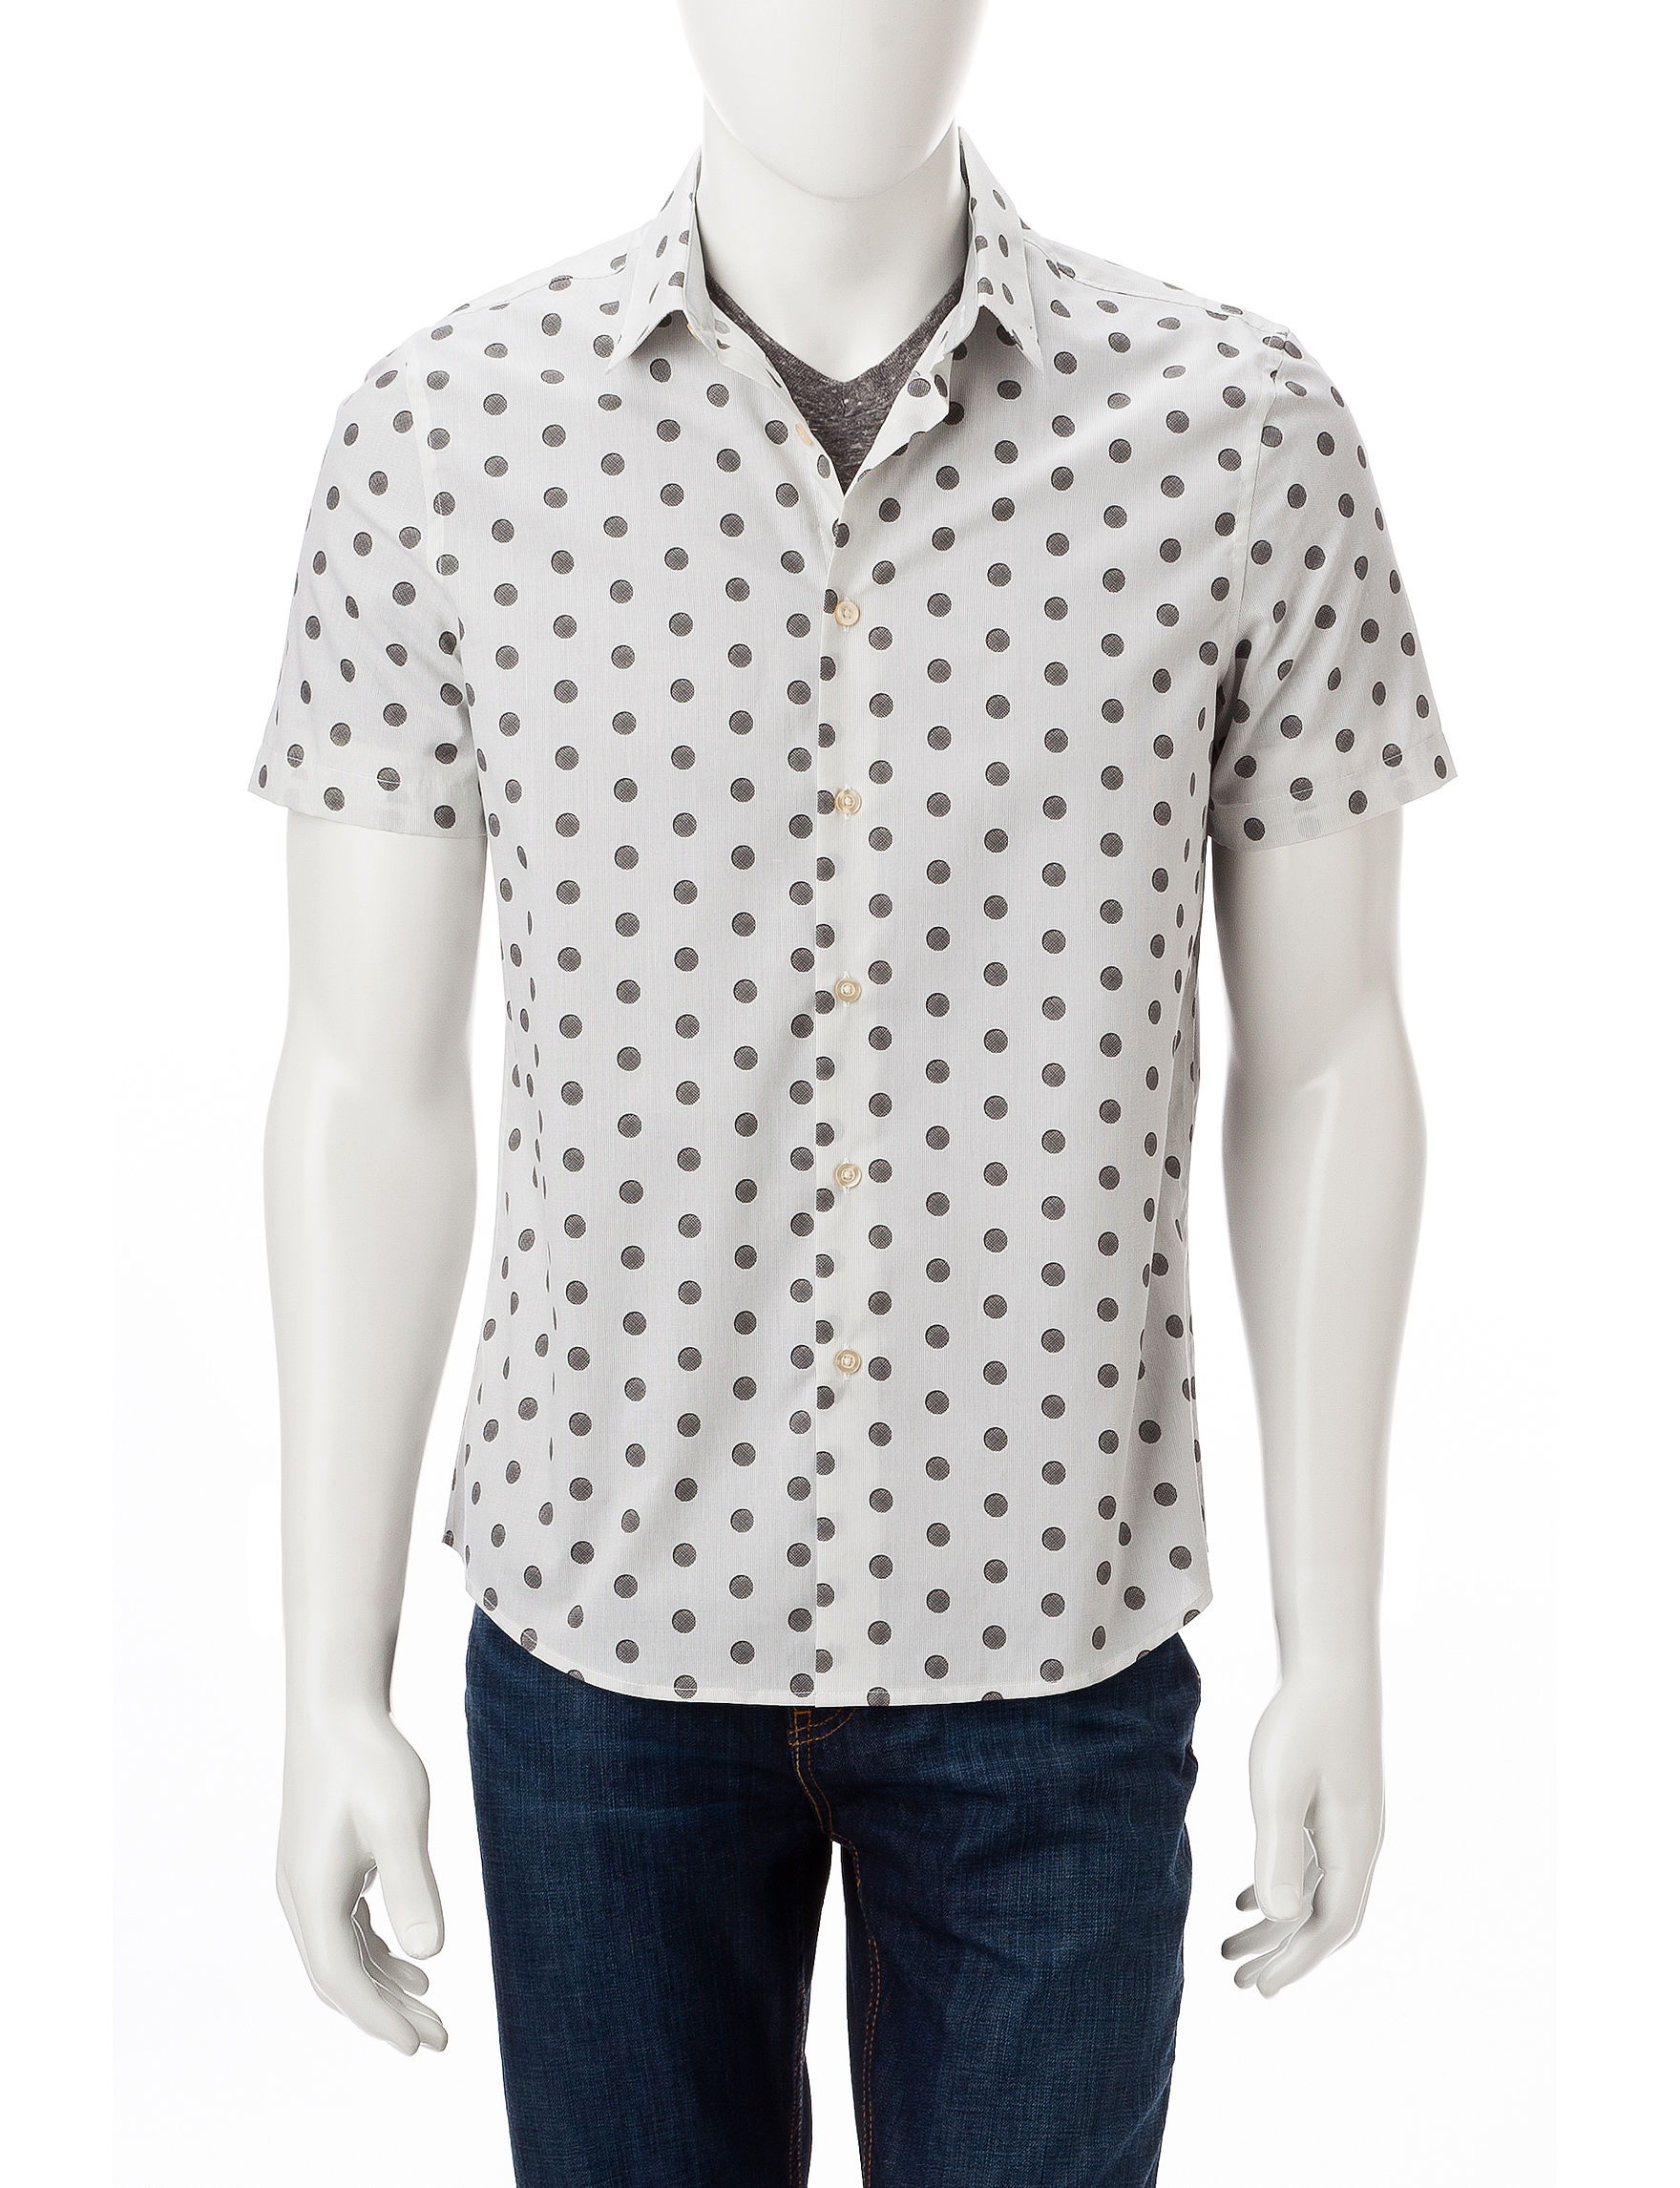 Axist Bright White Casual Button Down Shirts